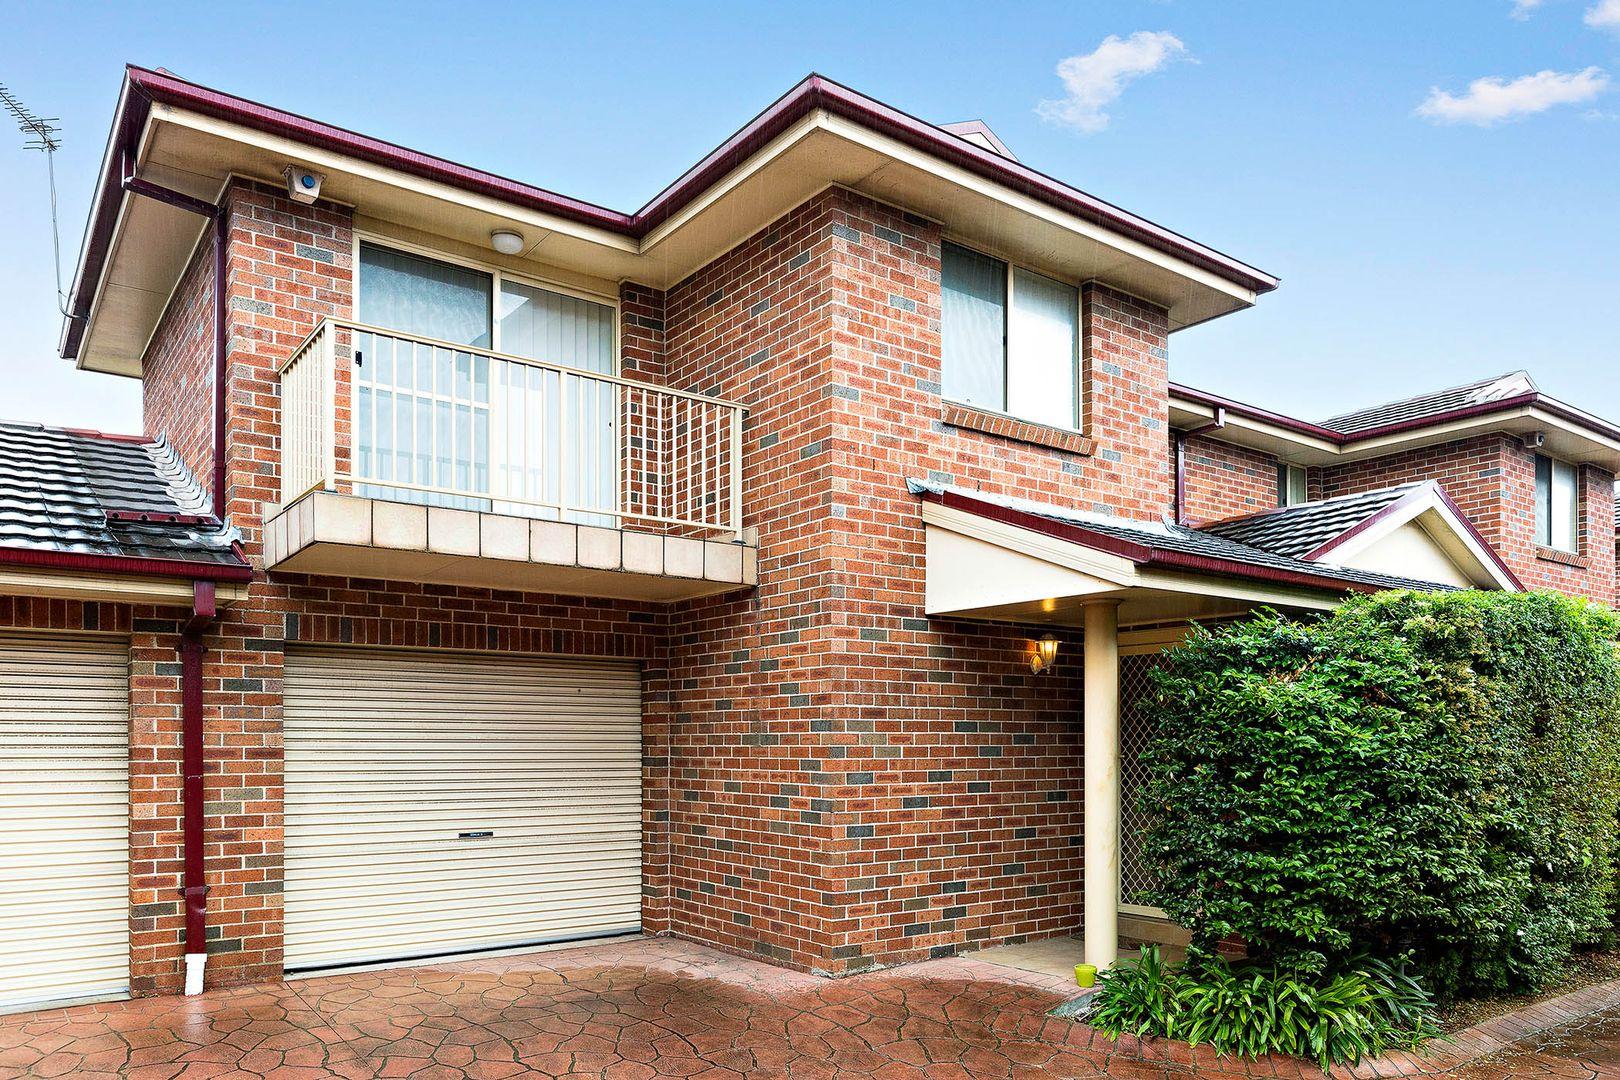 3/100 Church Street, Wollongong NSW 2500, Image 0